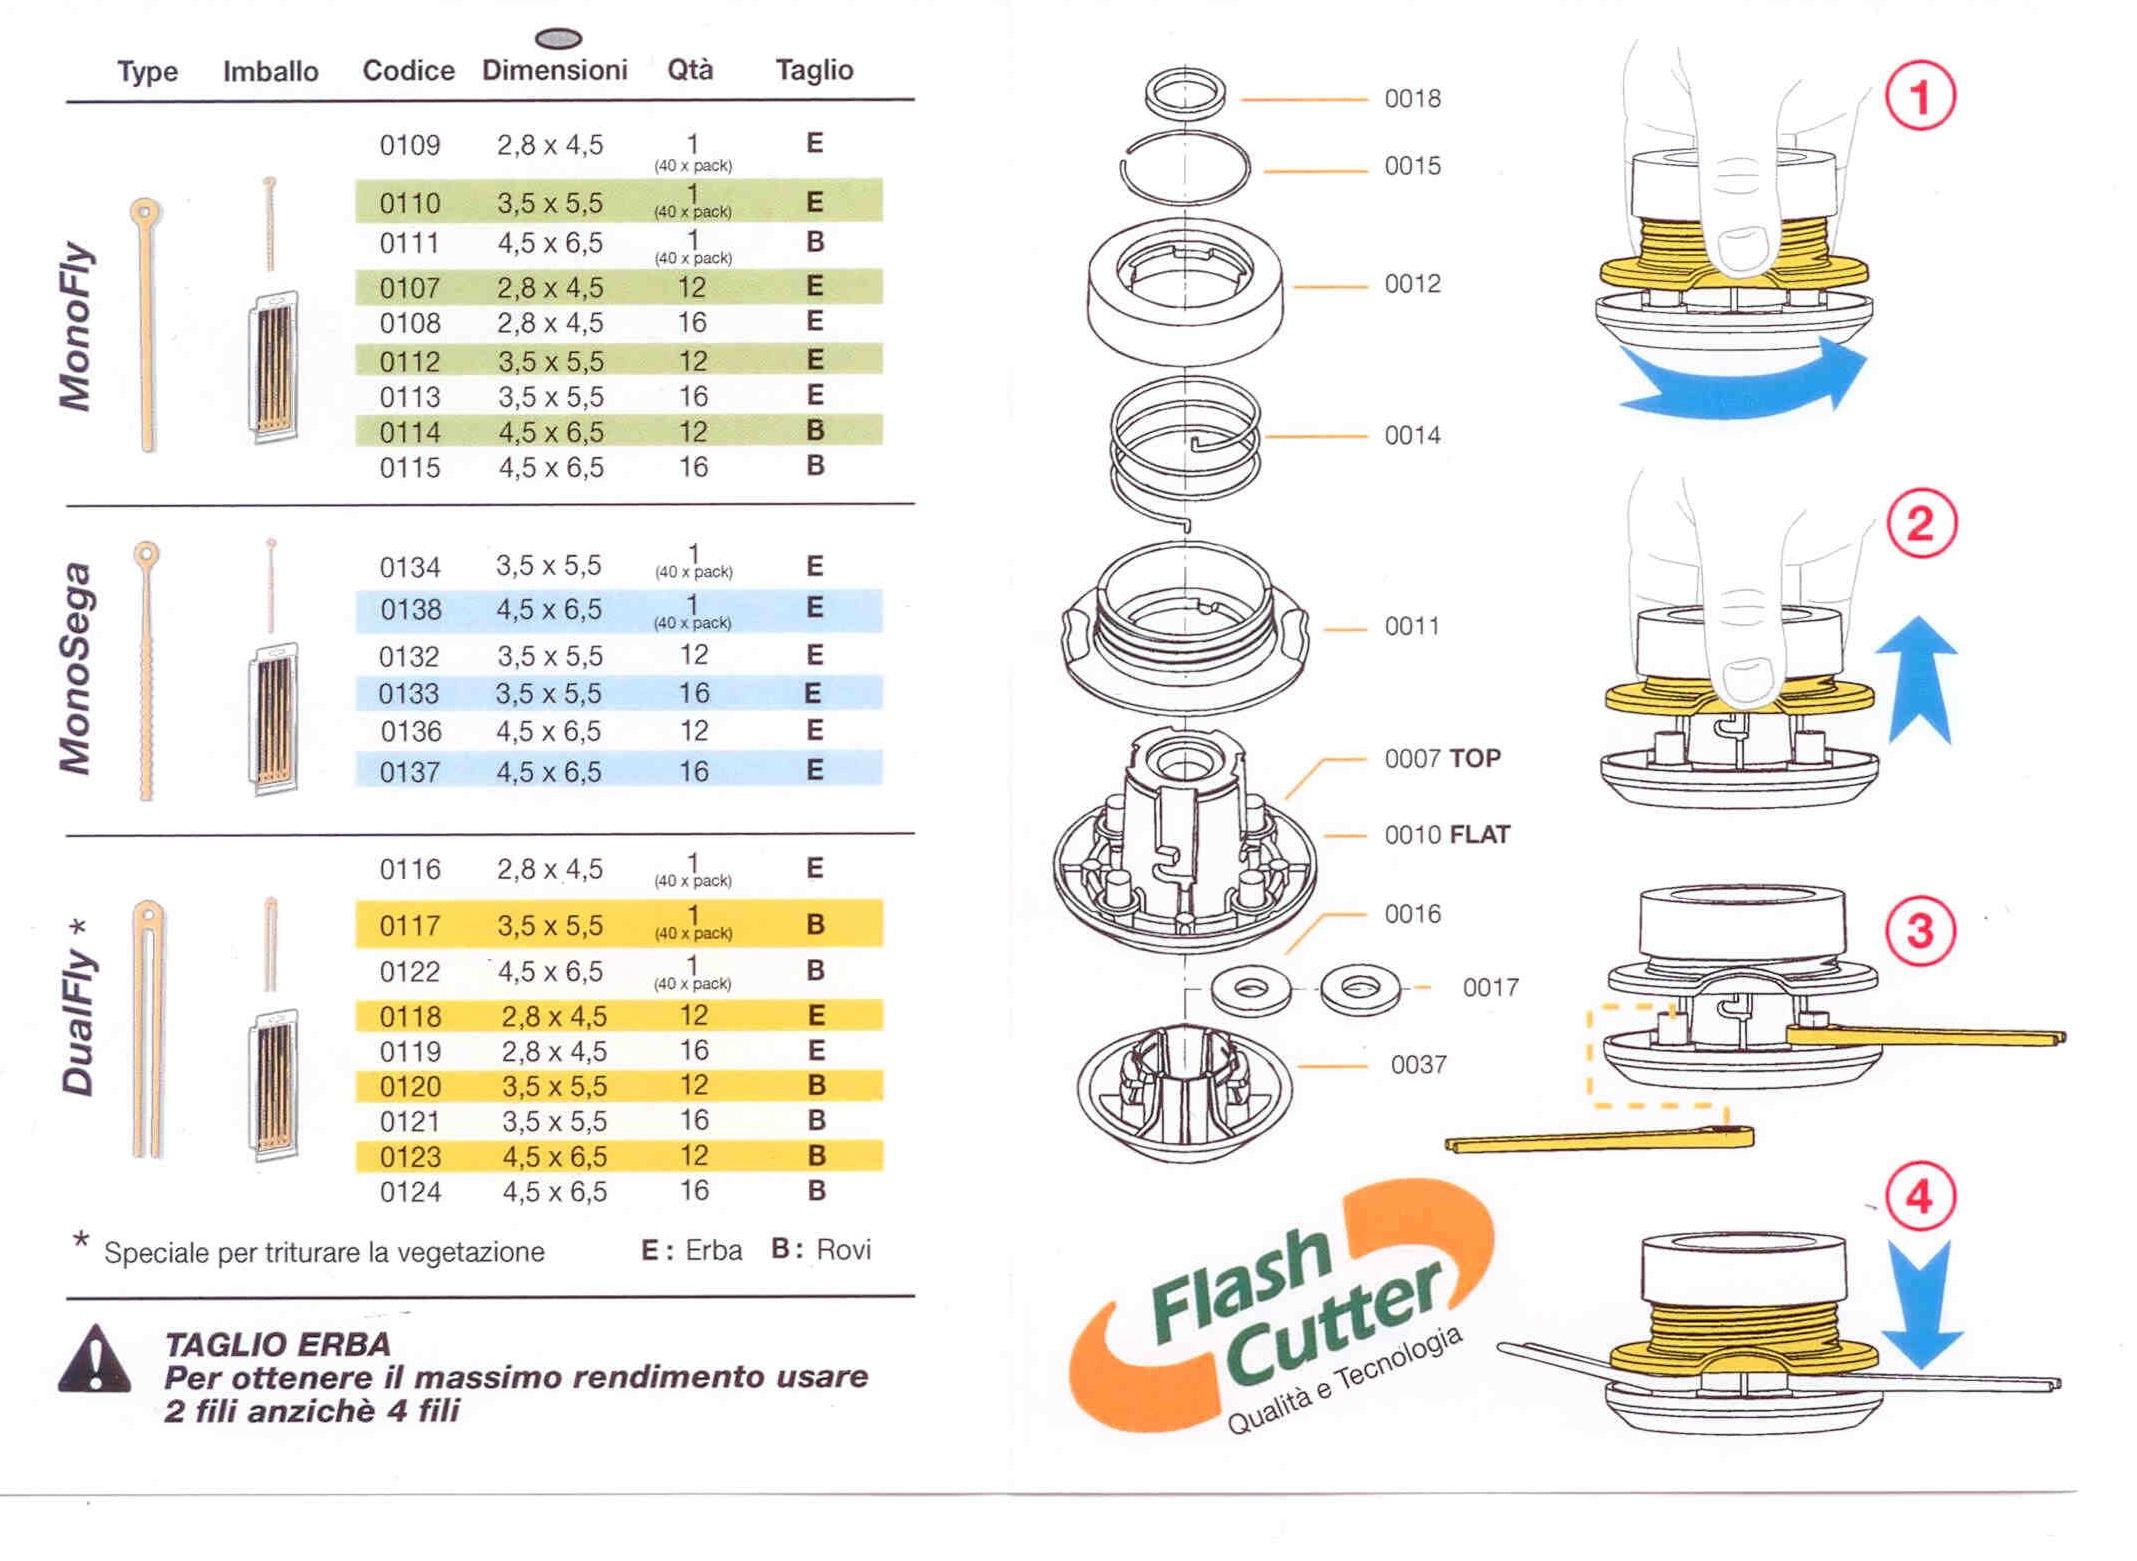 LAMELLE PER TESTINA FLASH CUTTER SEZIONE OVALE 2,8x4,5 MM MONOFLY 40 pz 10...